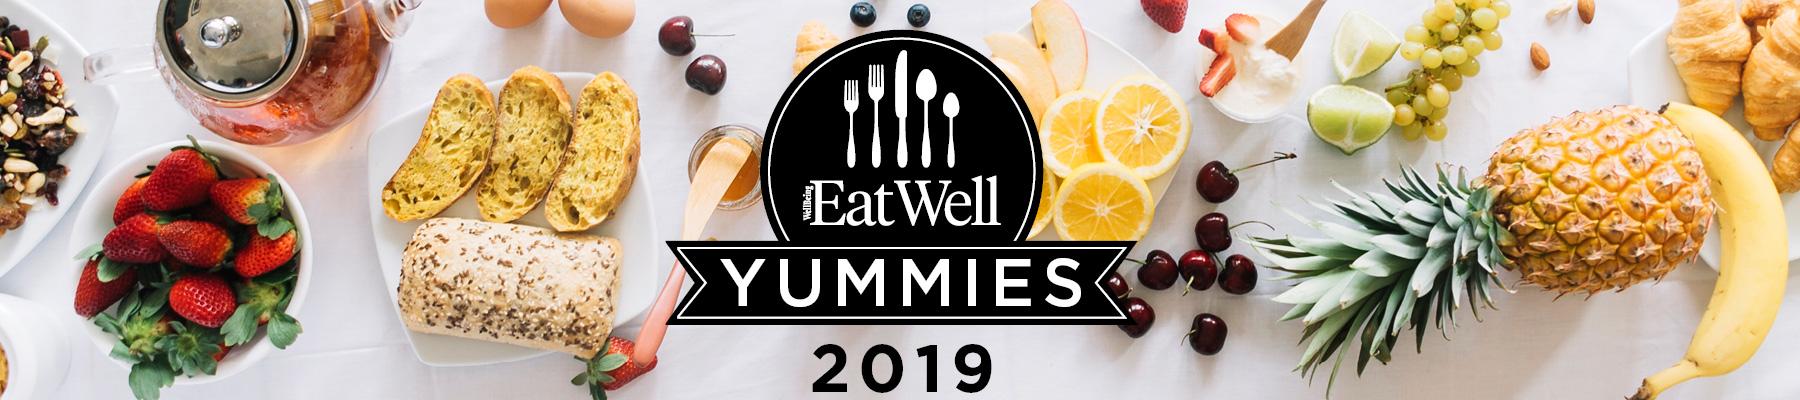 Ew Yummies 2019 1800x500